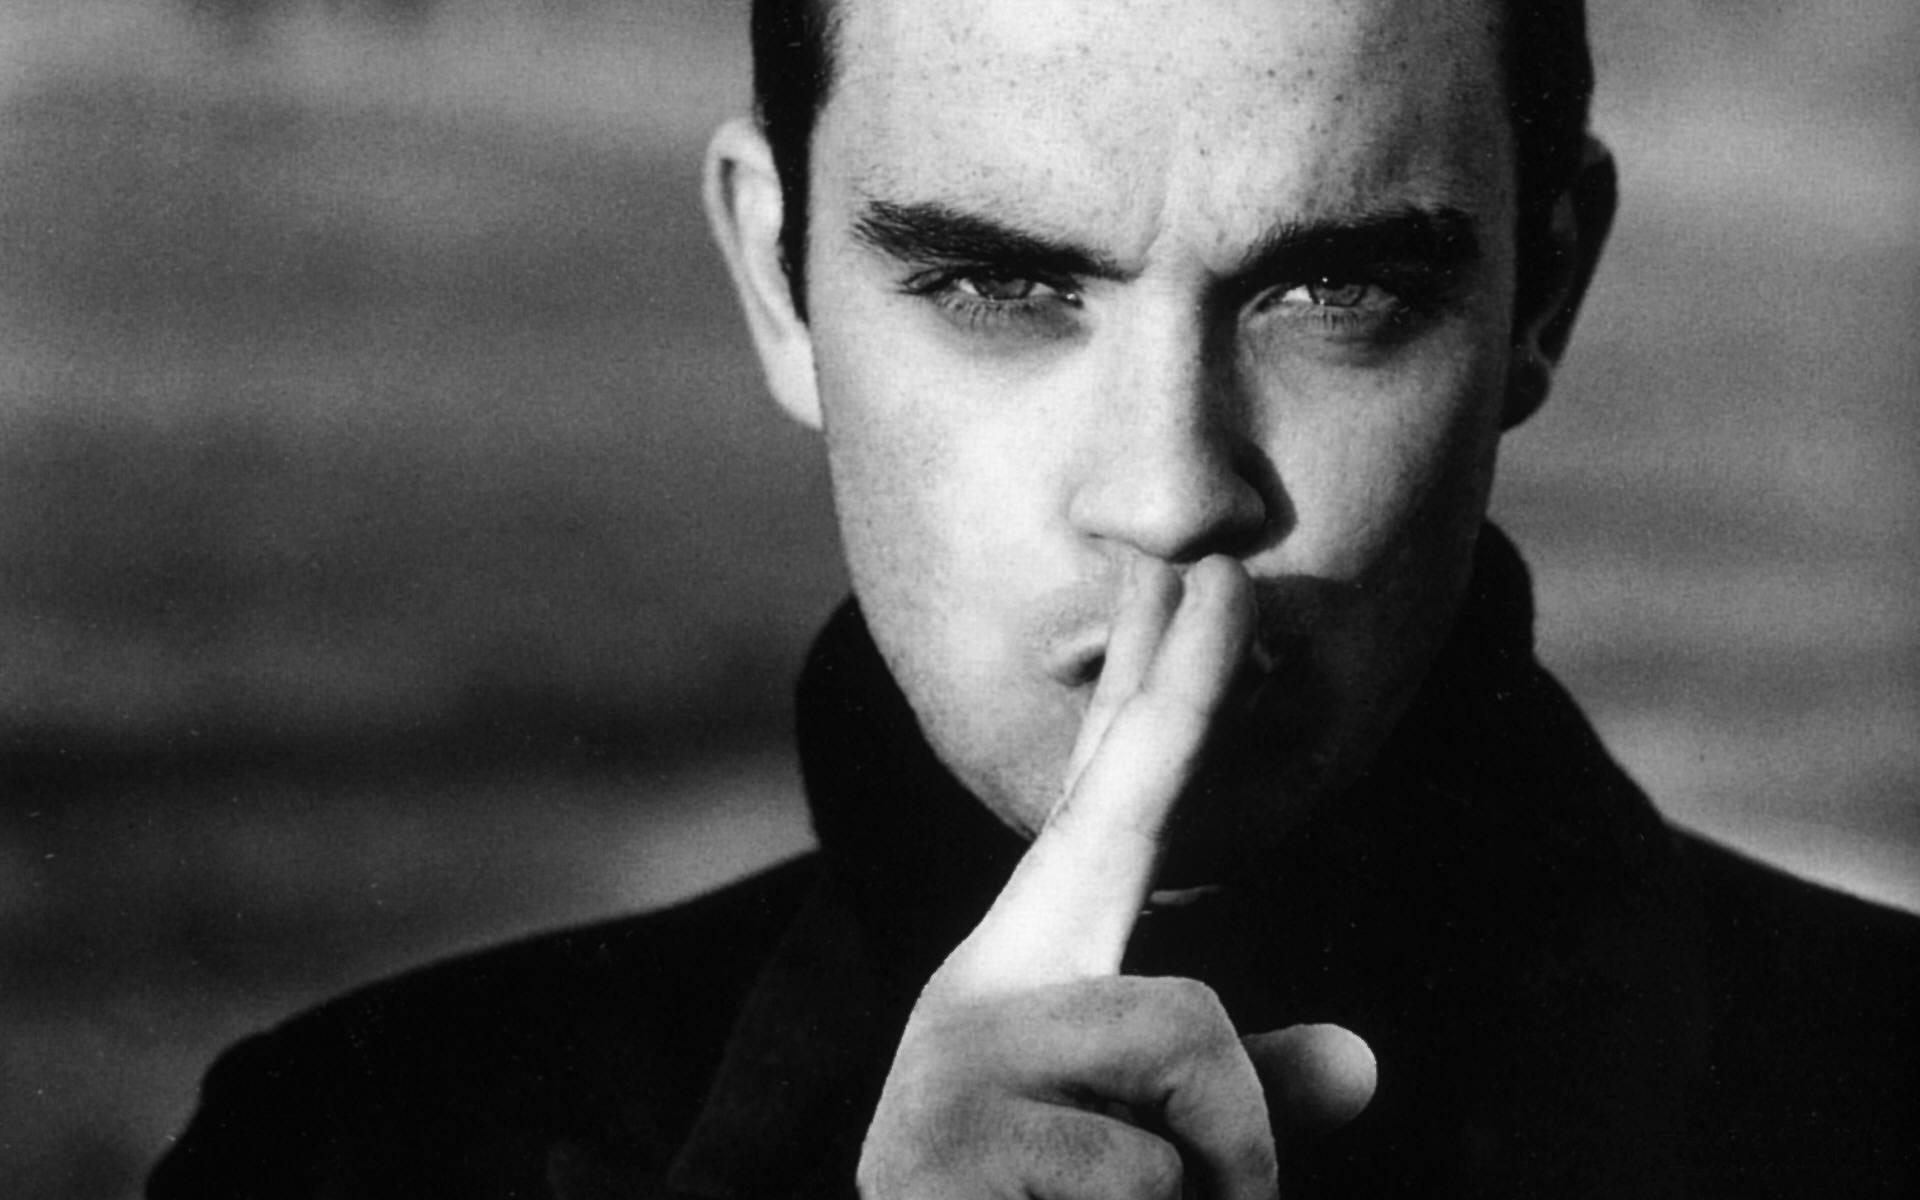 Robbie Williams Background